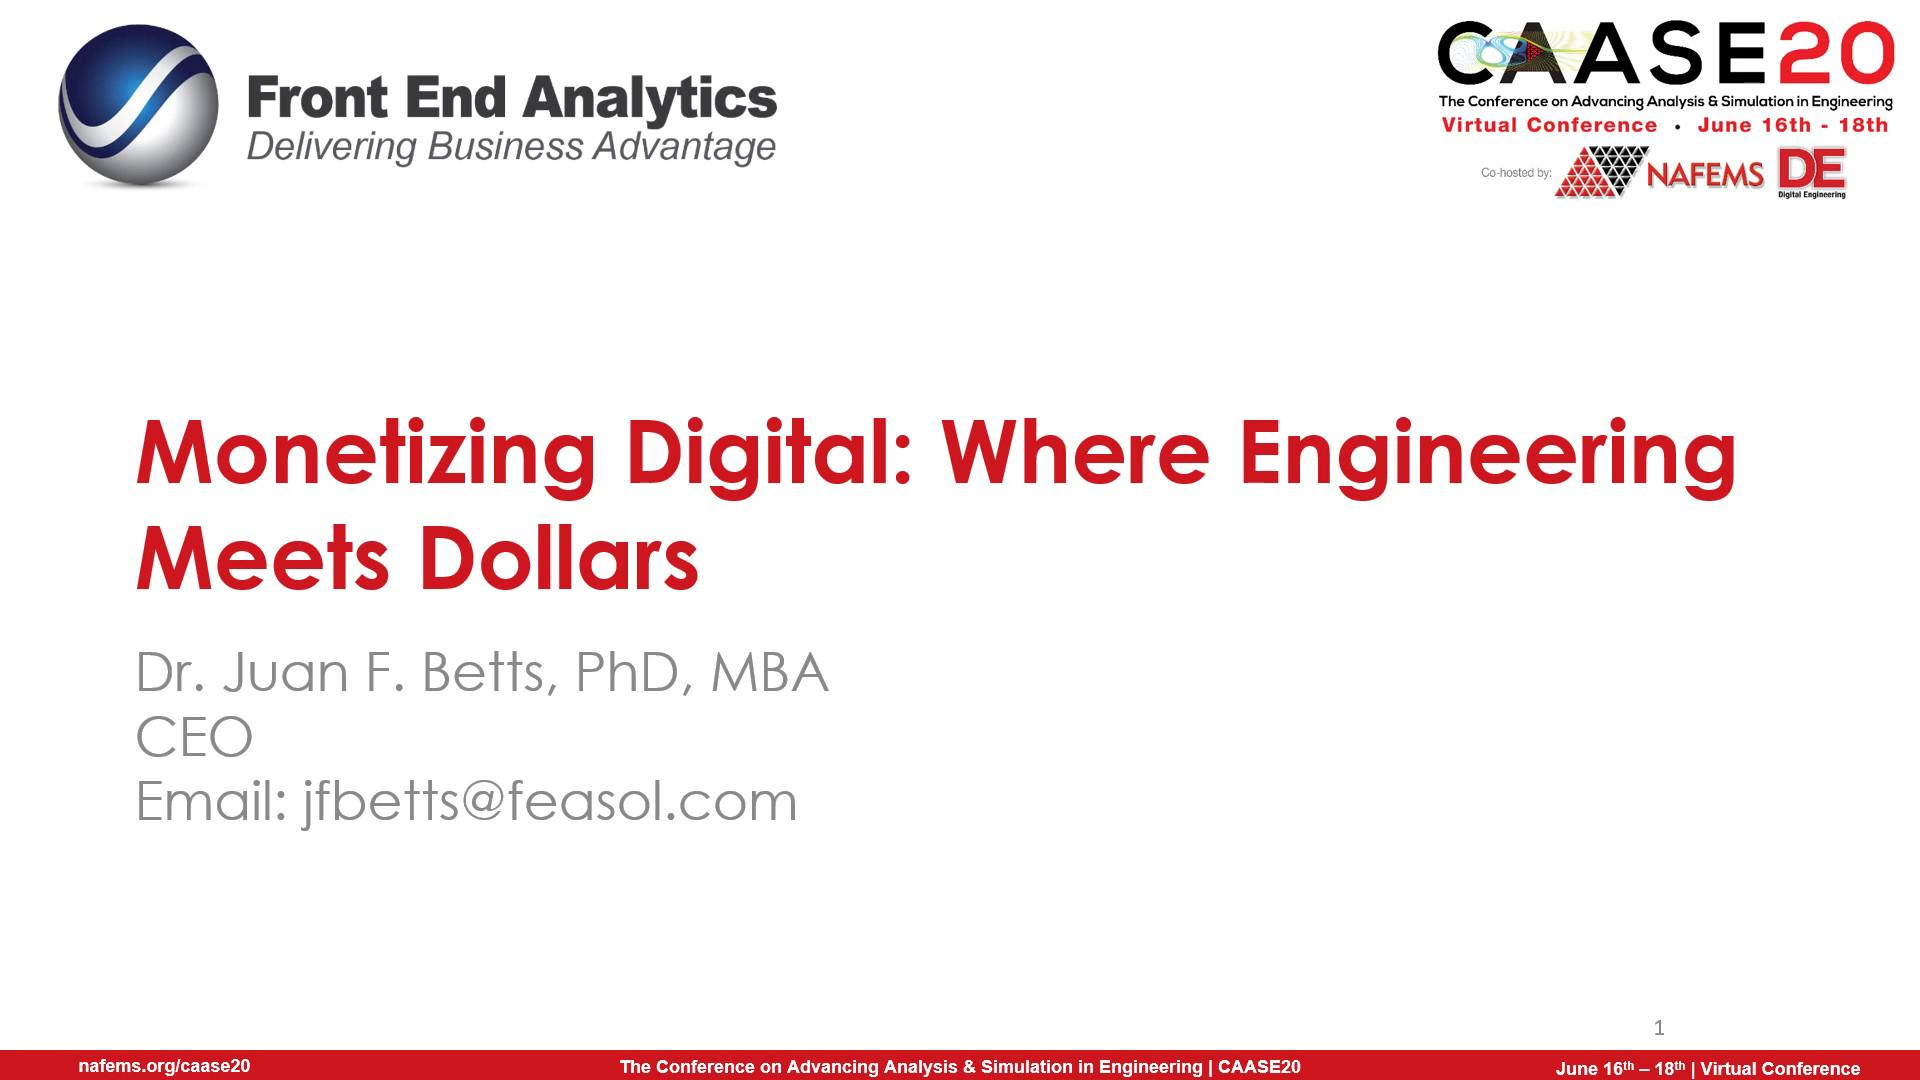 Monetizing Digital Where Engineering Meets Dollars thumb